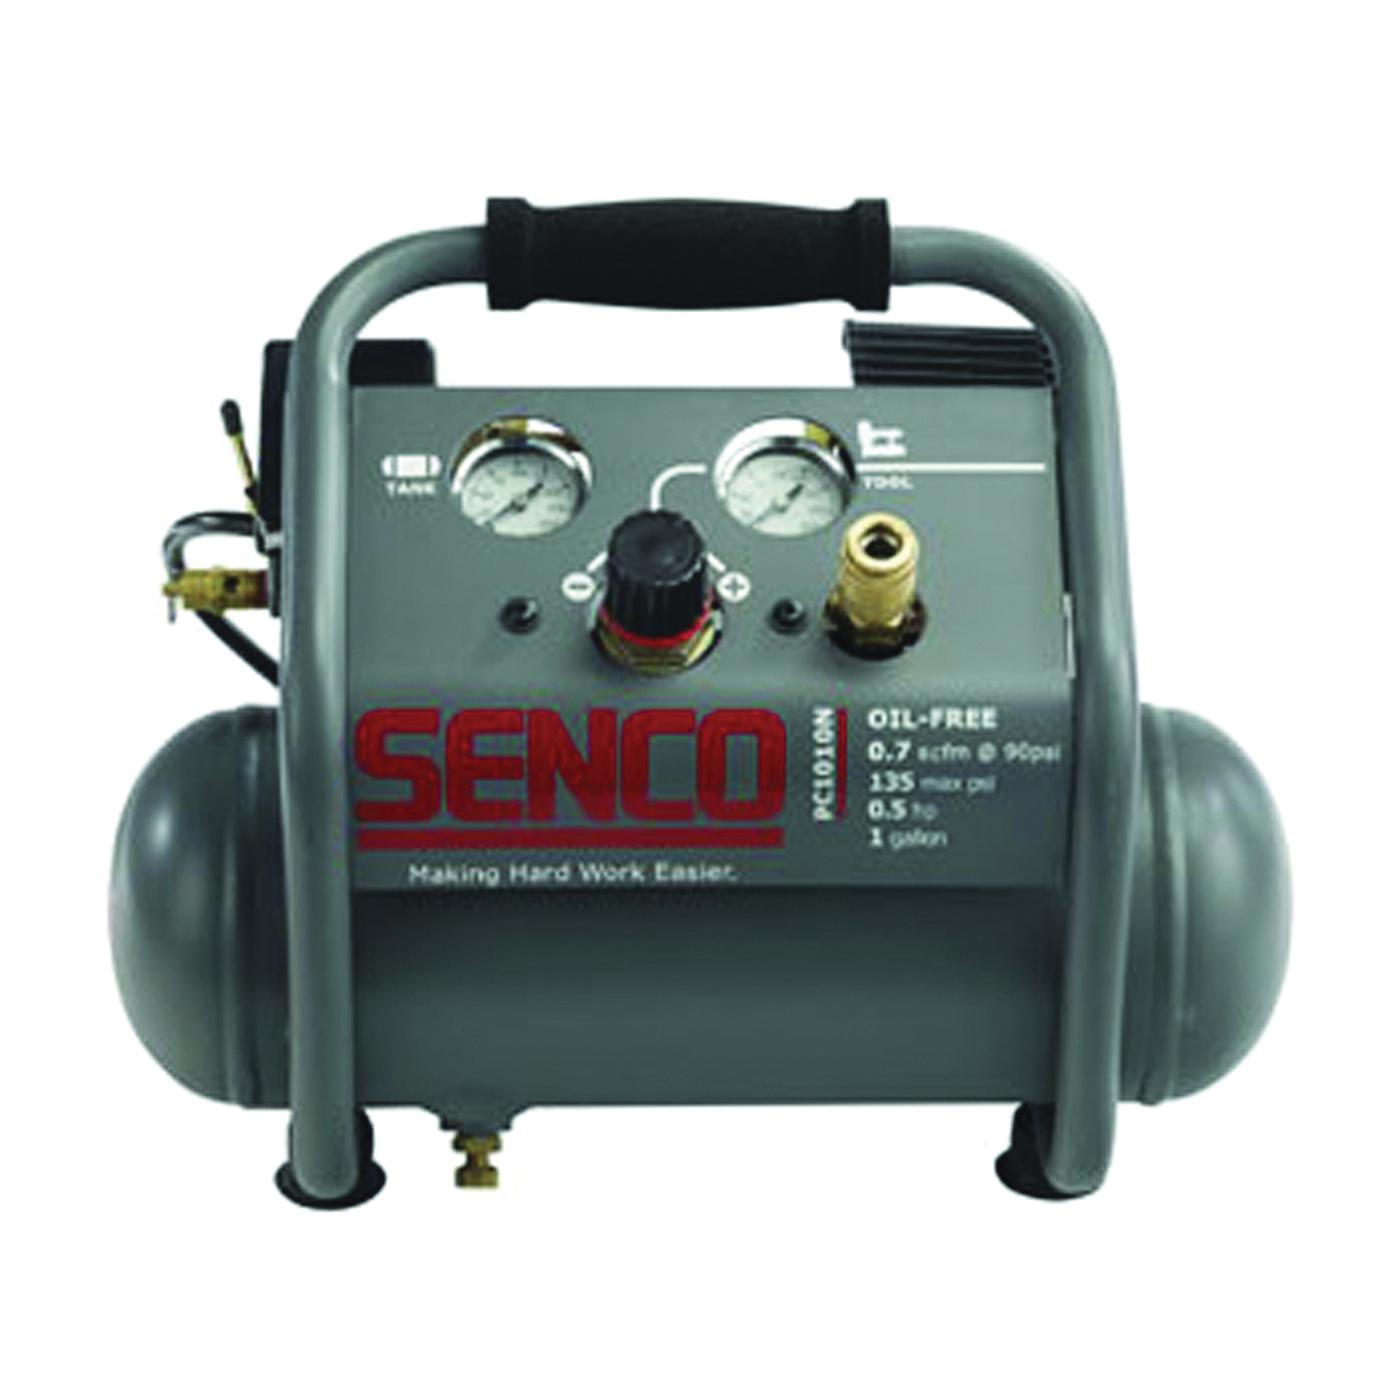 Picture of SENCO PC1010N Trim Air Compressor with Control Panel, 1 gal Tank, 0.5 hp, 115 V, 135 psi Pressure, 0.7 scfm Air